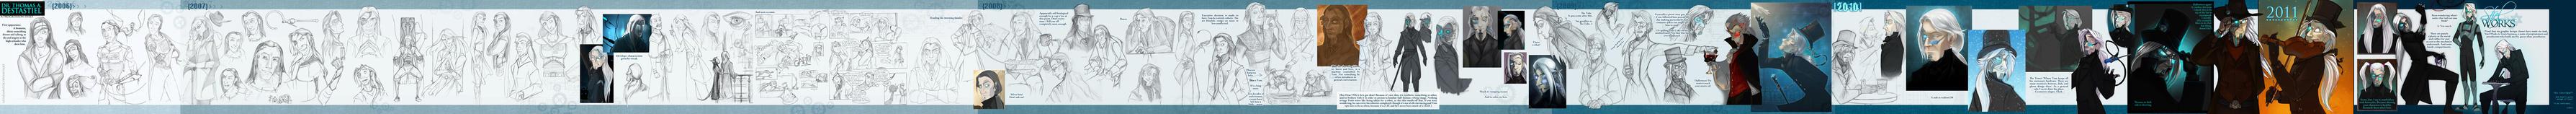 Tom Progression Sheet 06-11 by Altalamatox